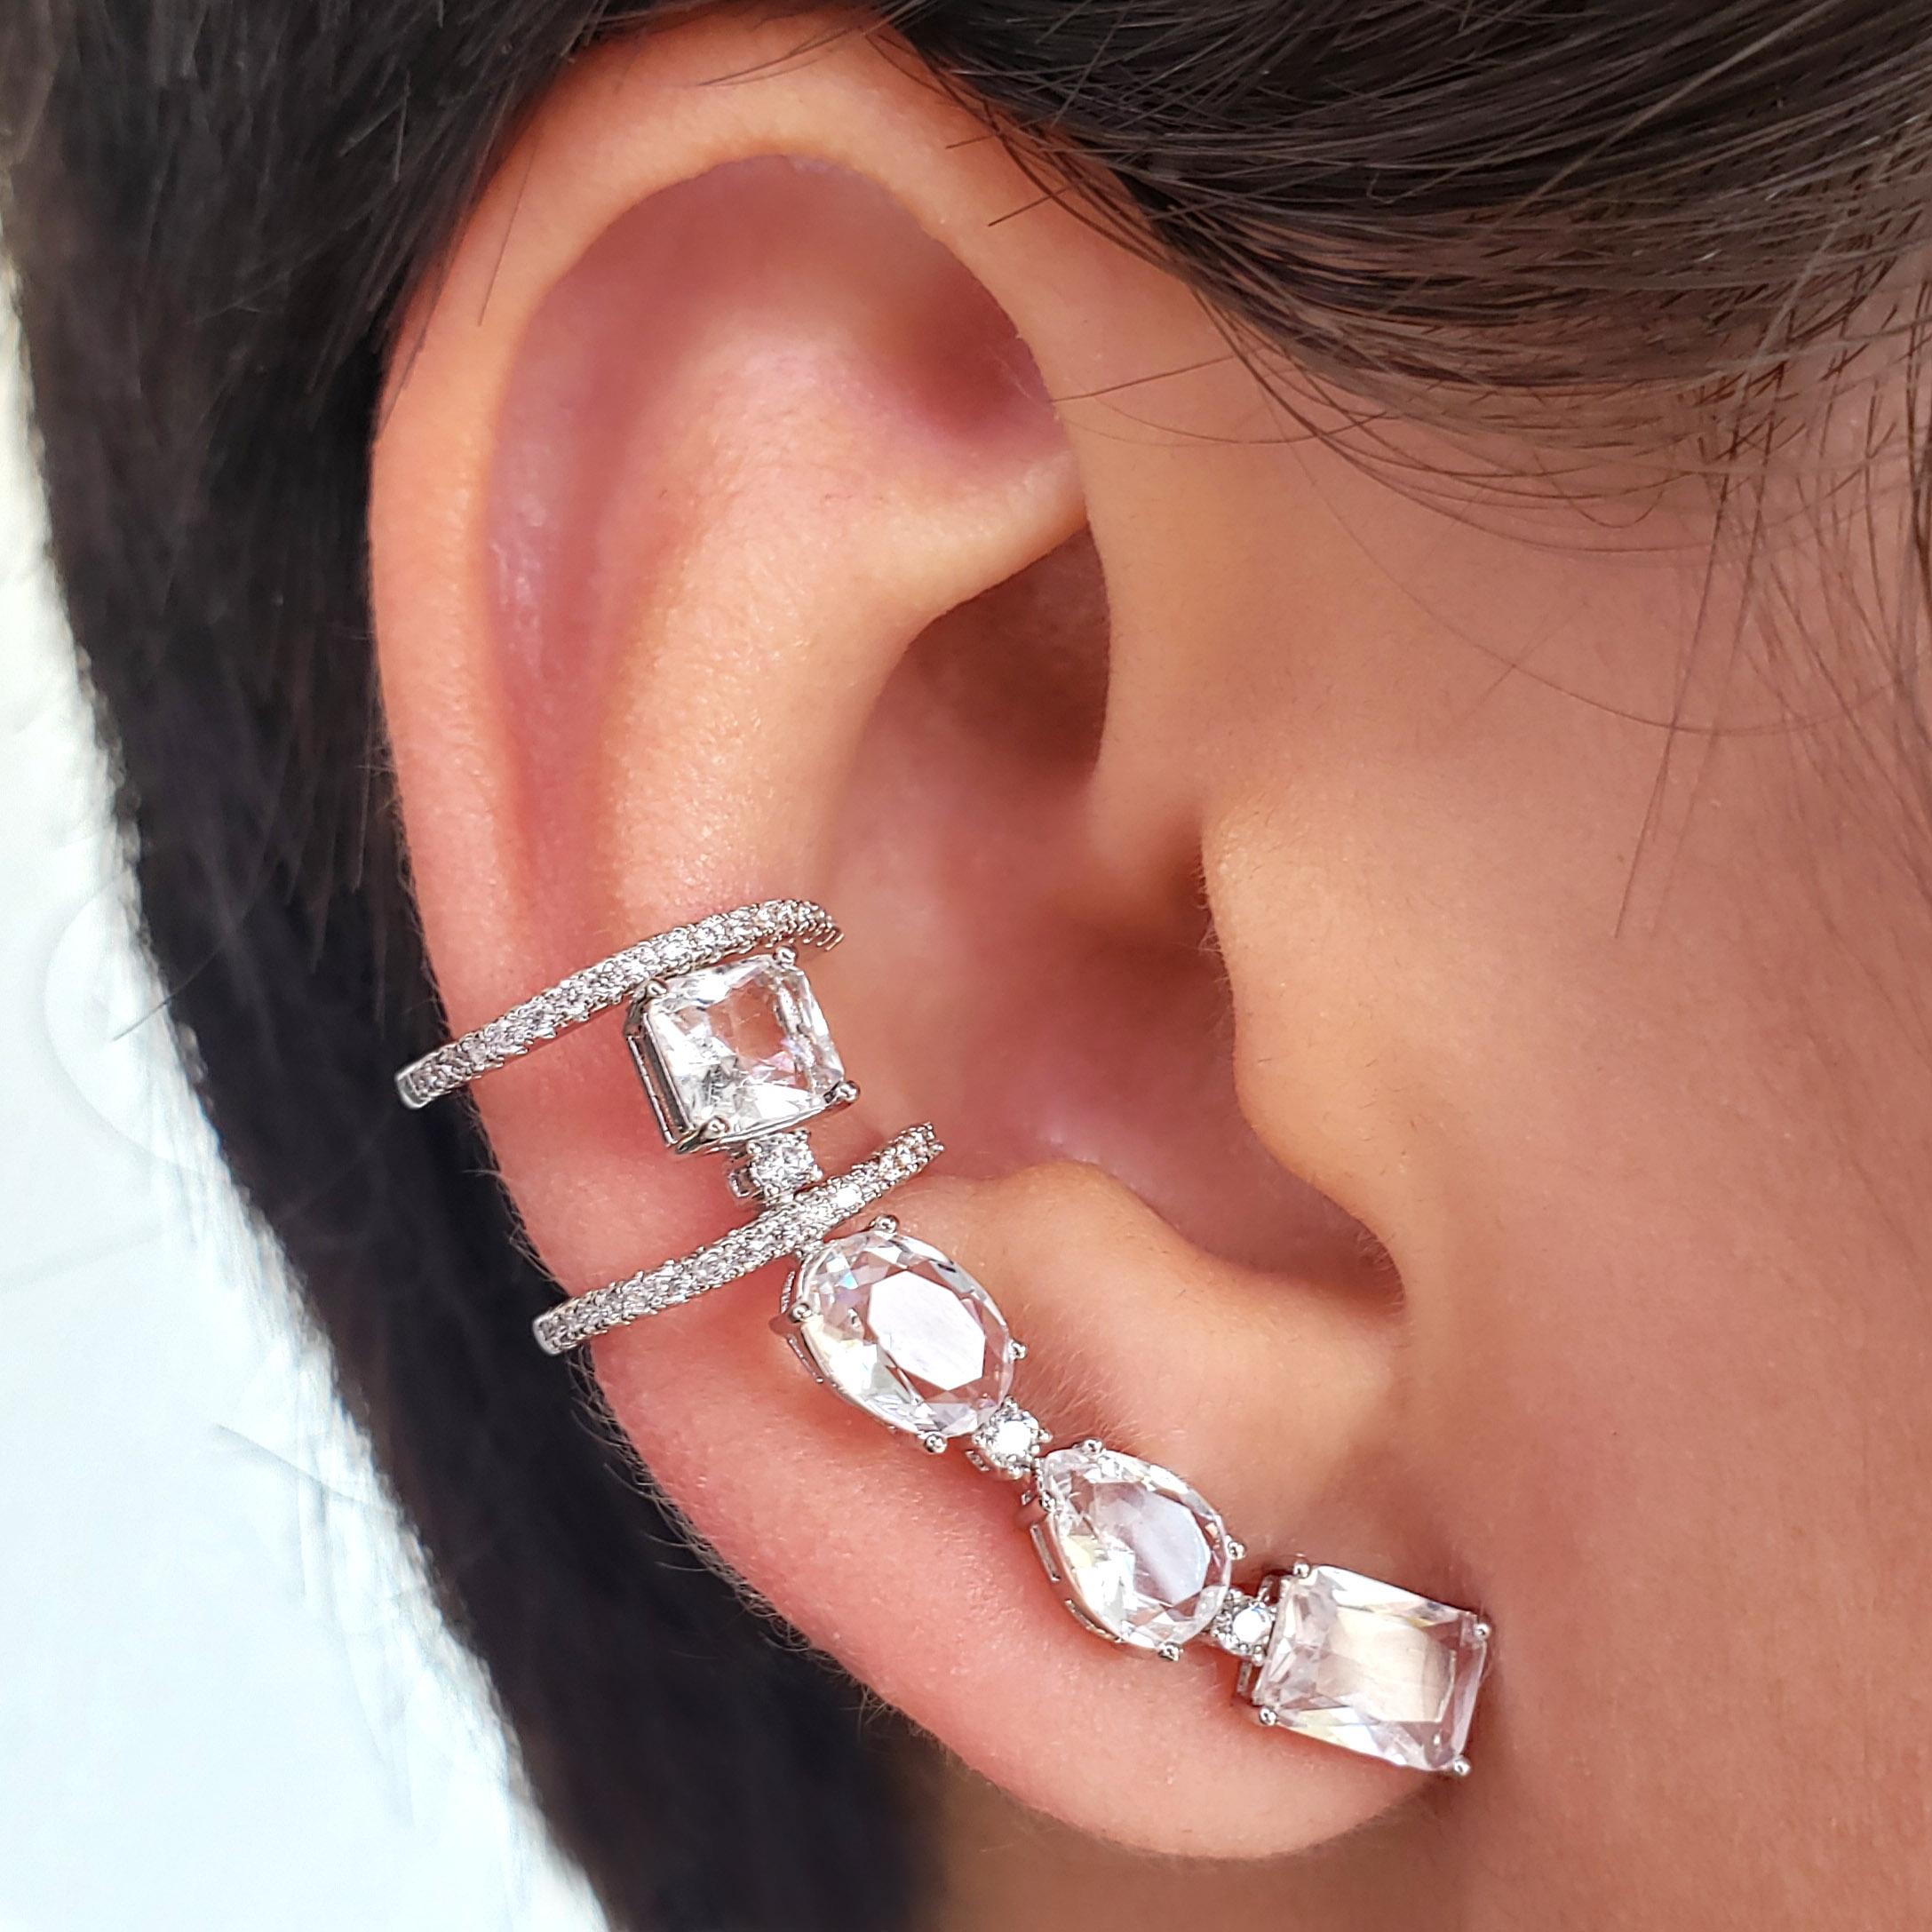 Brinco Ear Cuff Pequeno Zircônias Folheado Ródio Branco